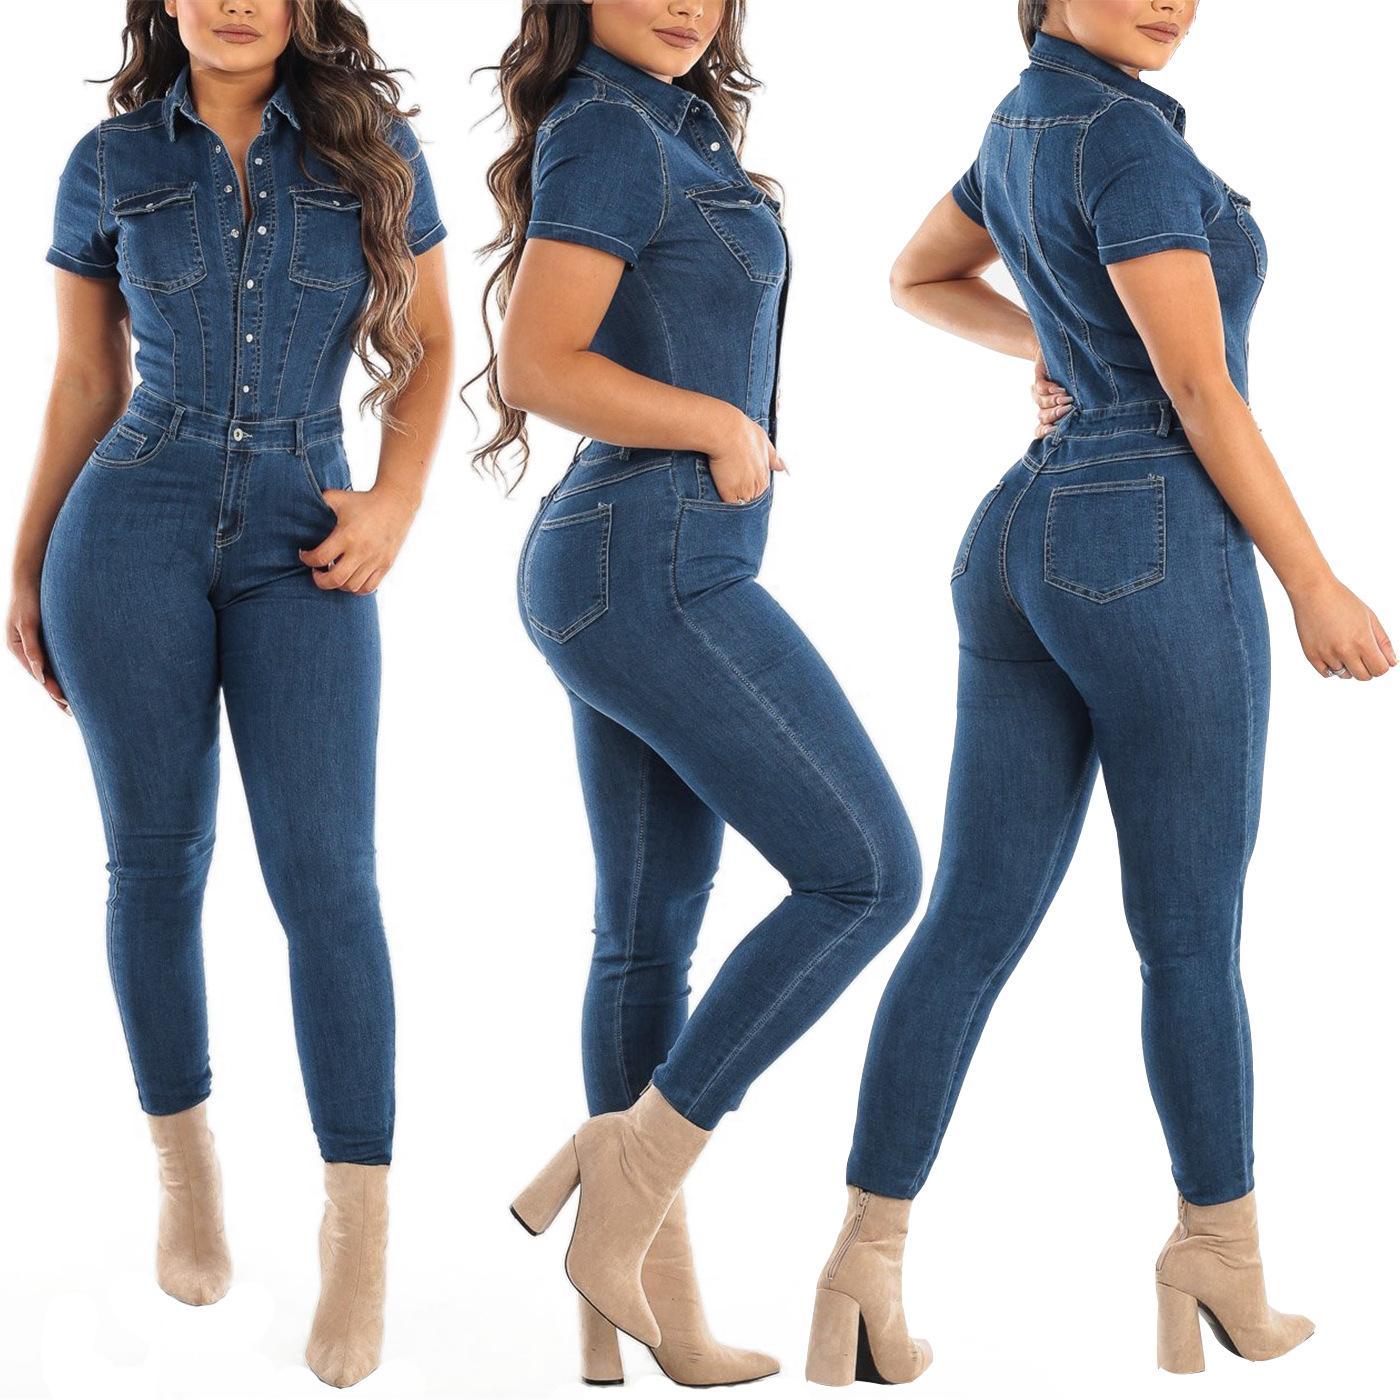 Mode Nouvelle combinaison à manches courtes Jeans Body Body Sexy Femmes Denim Chaude Casual Dossier Rompes Streetwear Taille S-2XL Real Photos